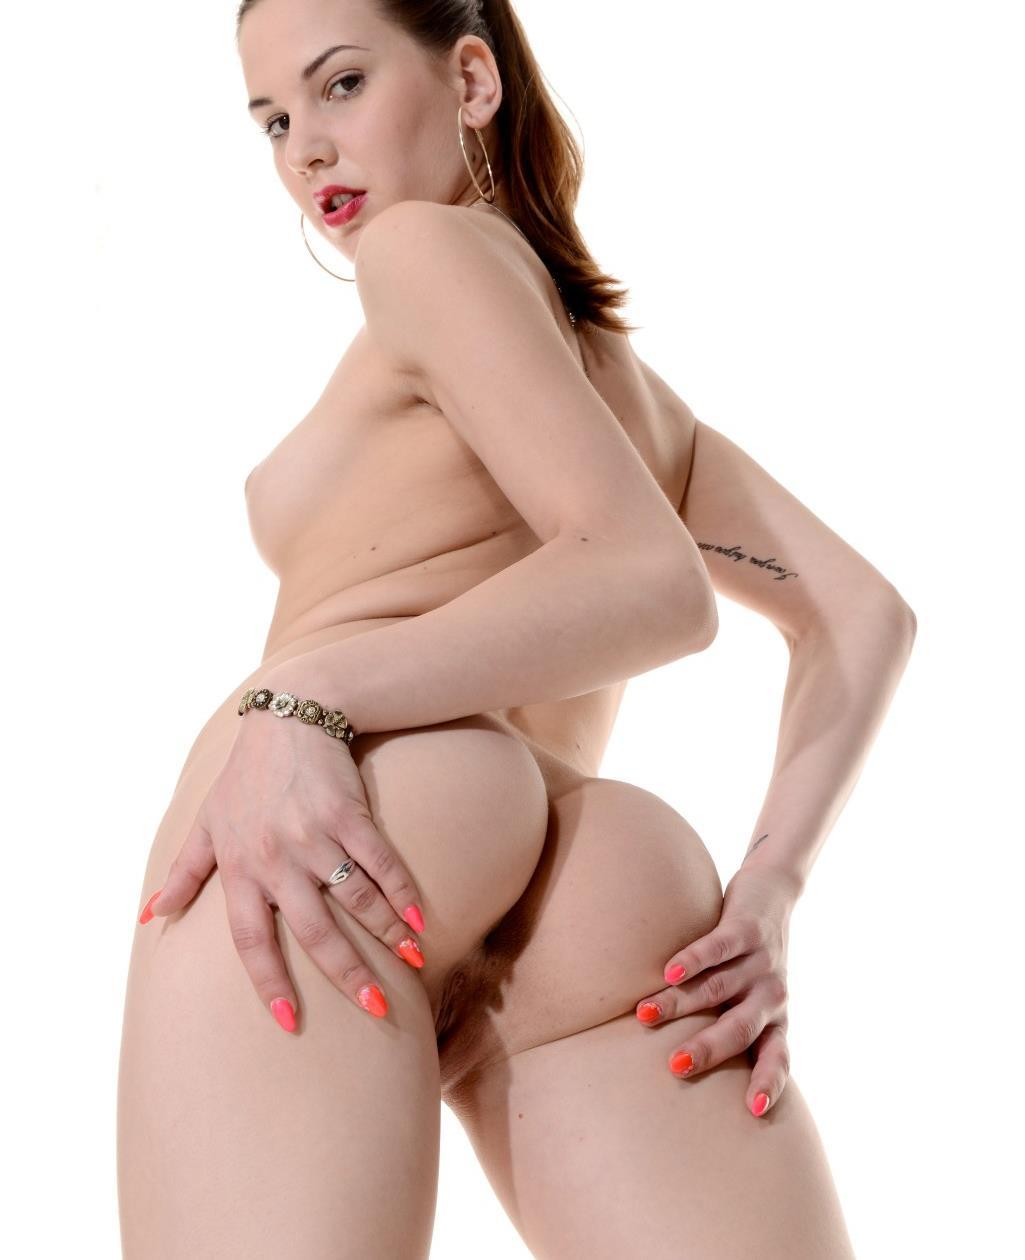 cum inside ass porn,brown and round butts,big bom sexy